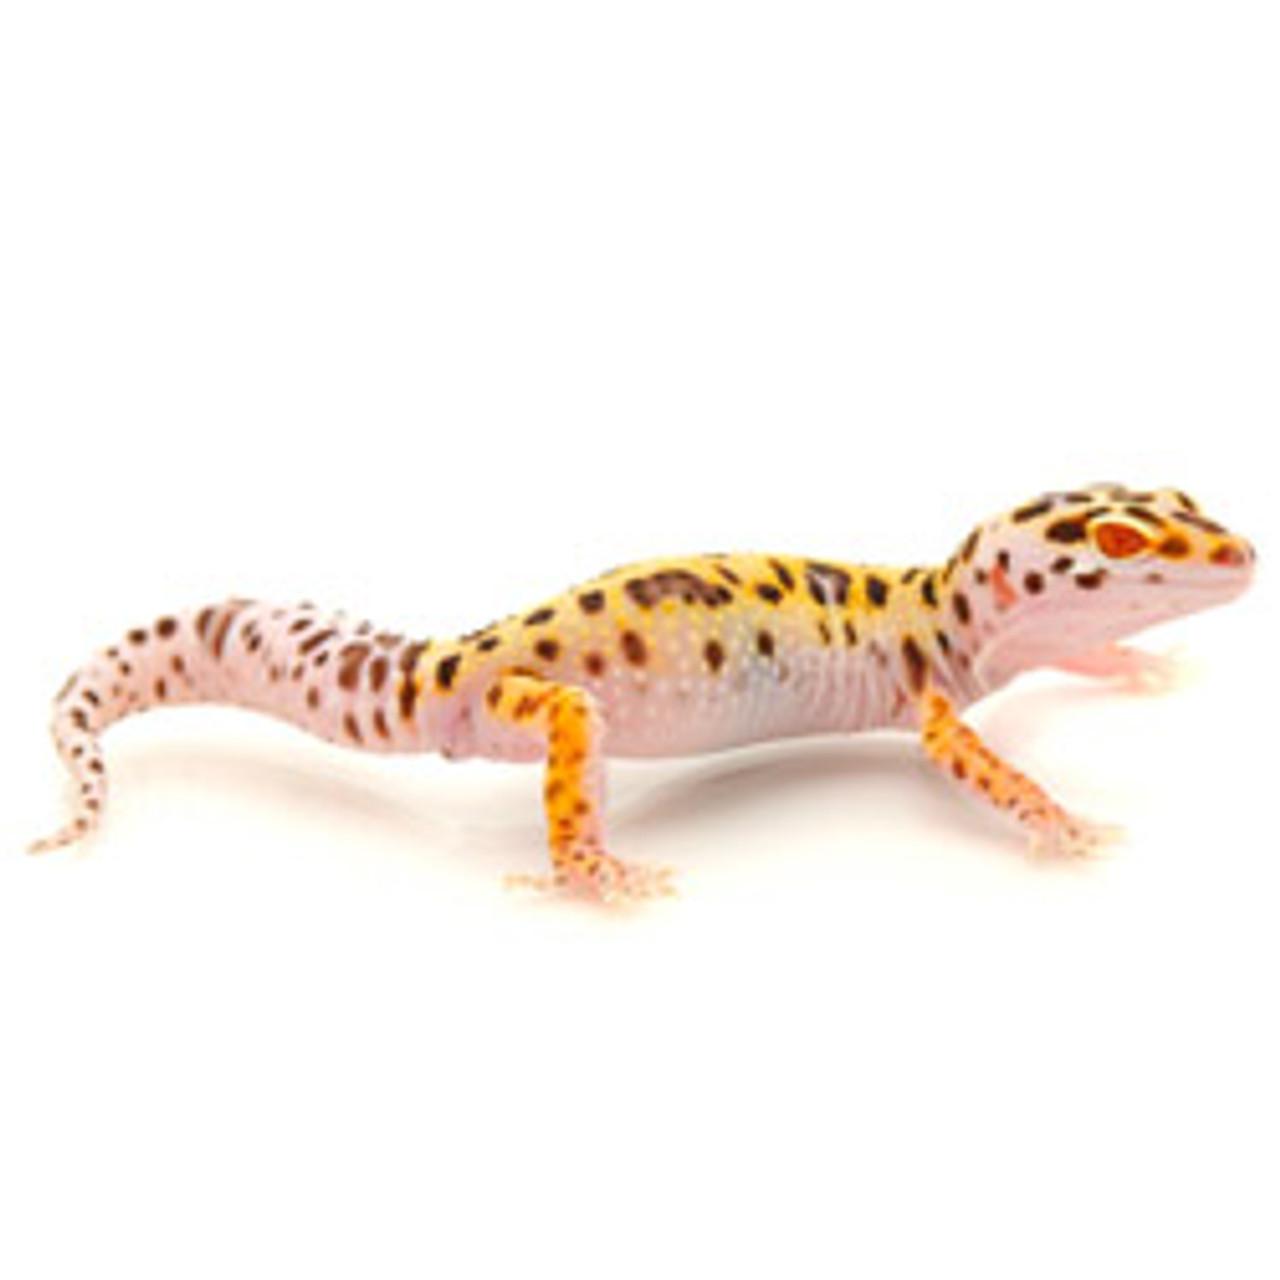 Bell Albino Enigma Leopard Gecko (Eublepharis macularius) BABY